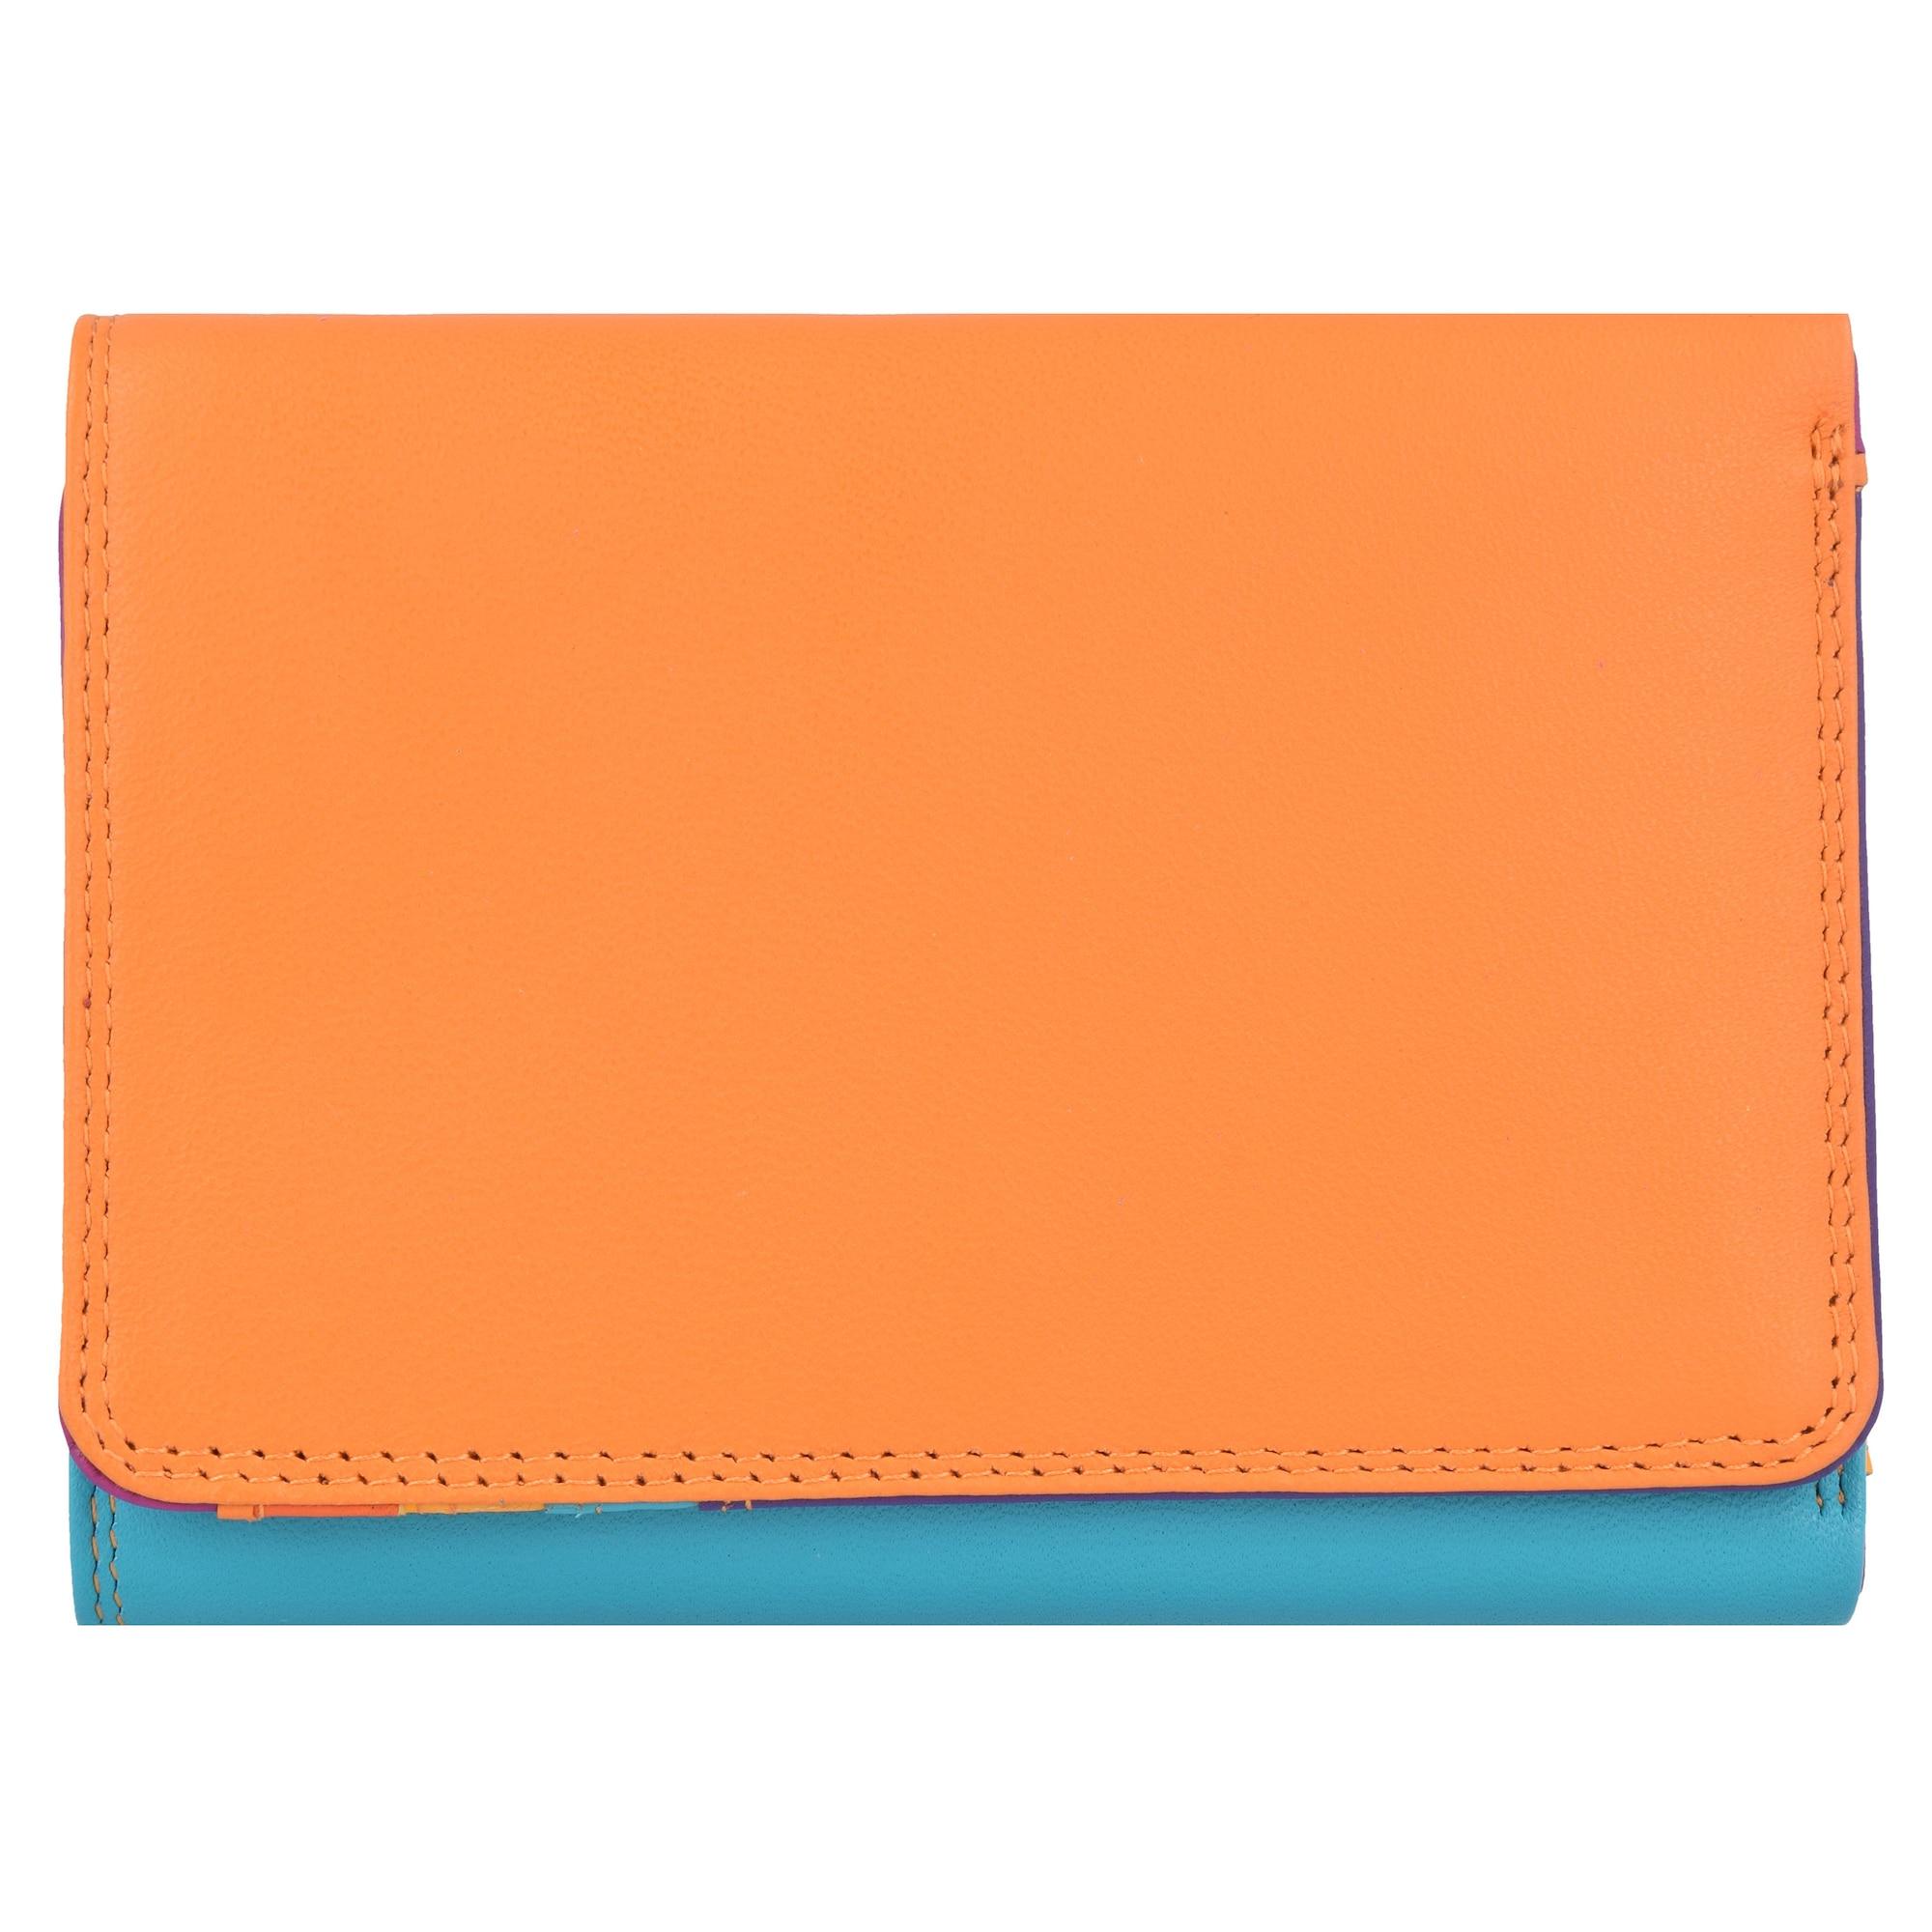 Geldbörse 'Medium Tri-fold' | Accessoires > Portemonnaies > Geldbörsen | Mywalit